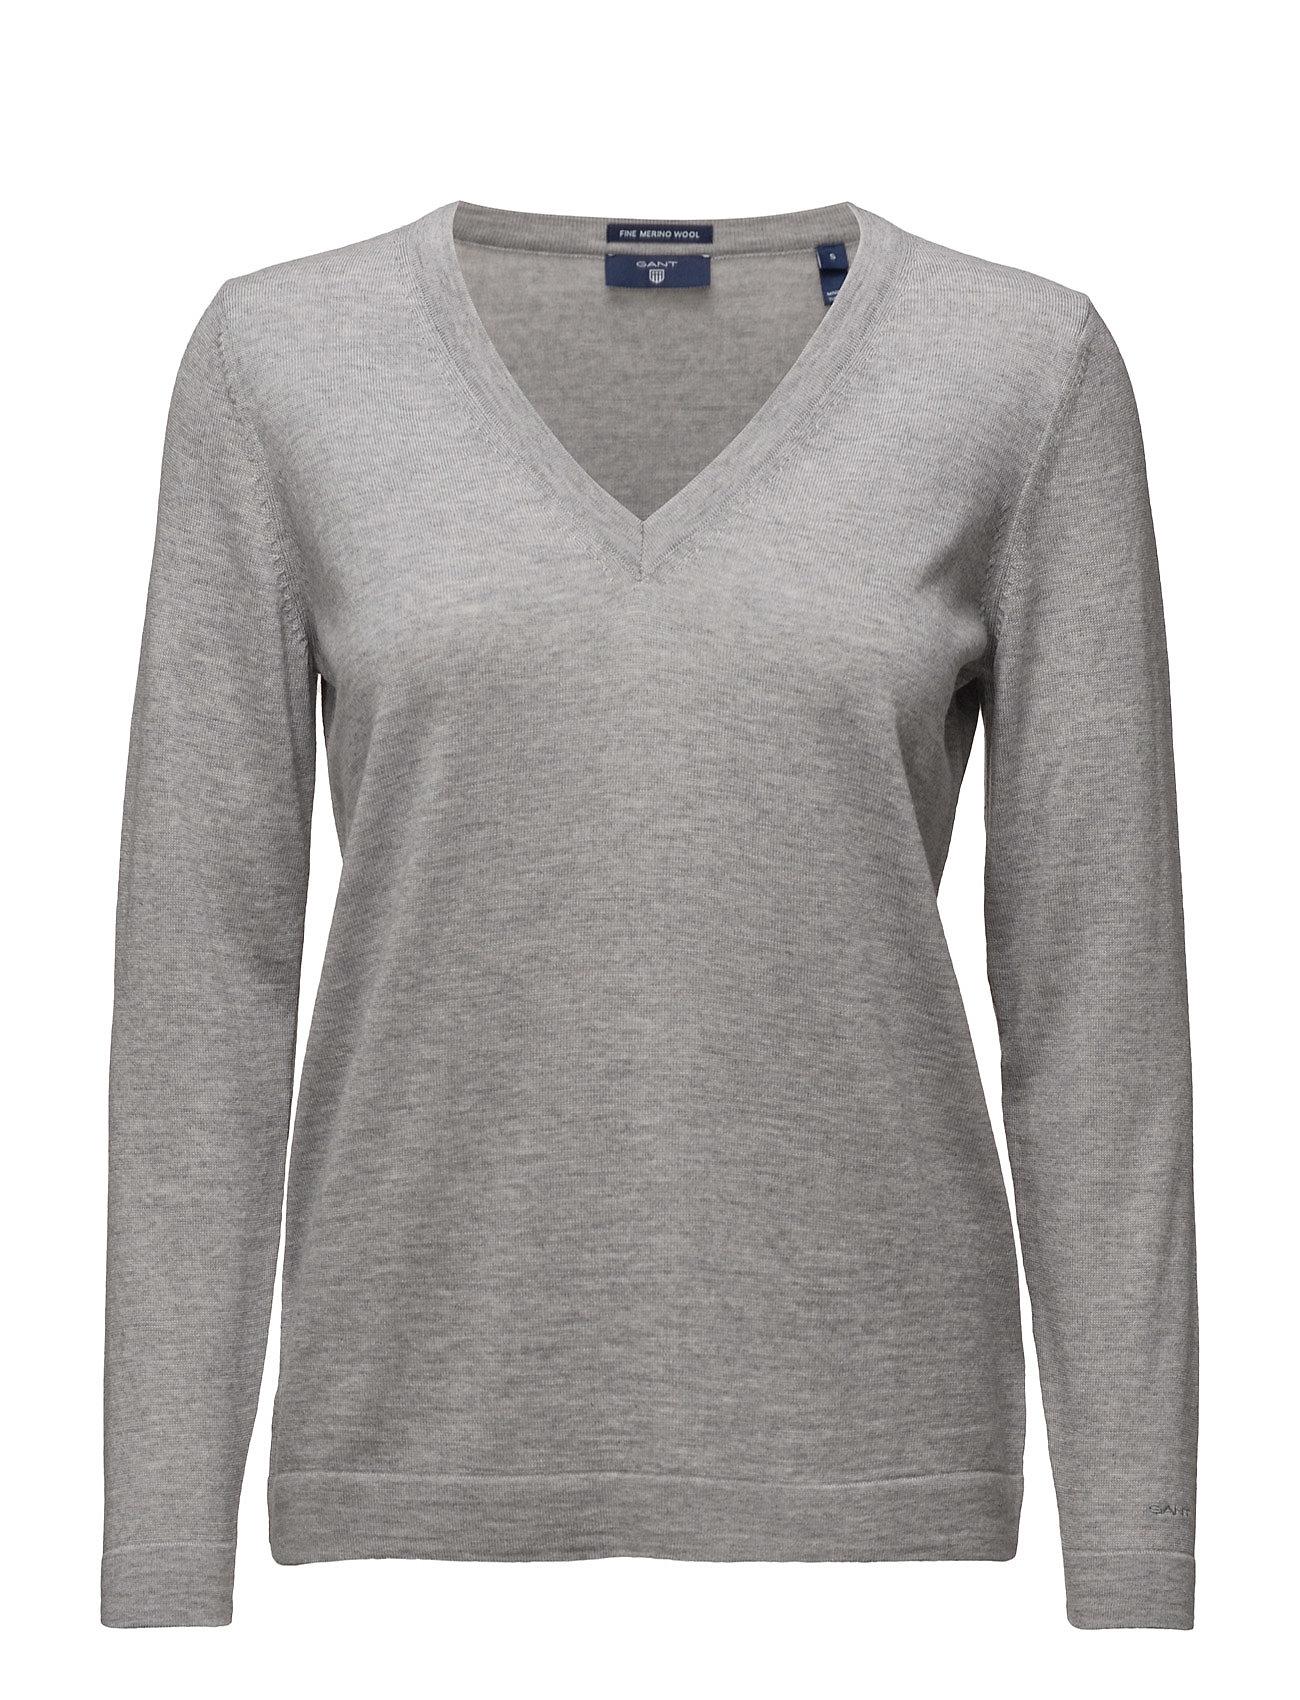 Fine Merino Wool V-Neck GANT Sweatshirts til Damer i Light Grey Melange